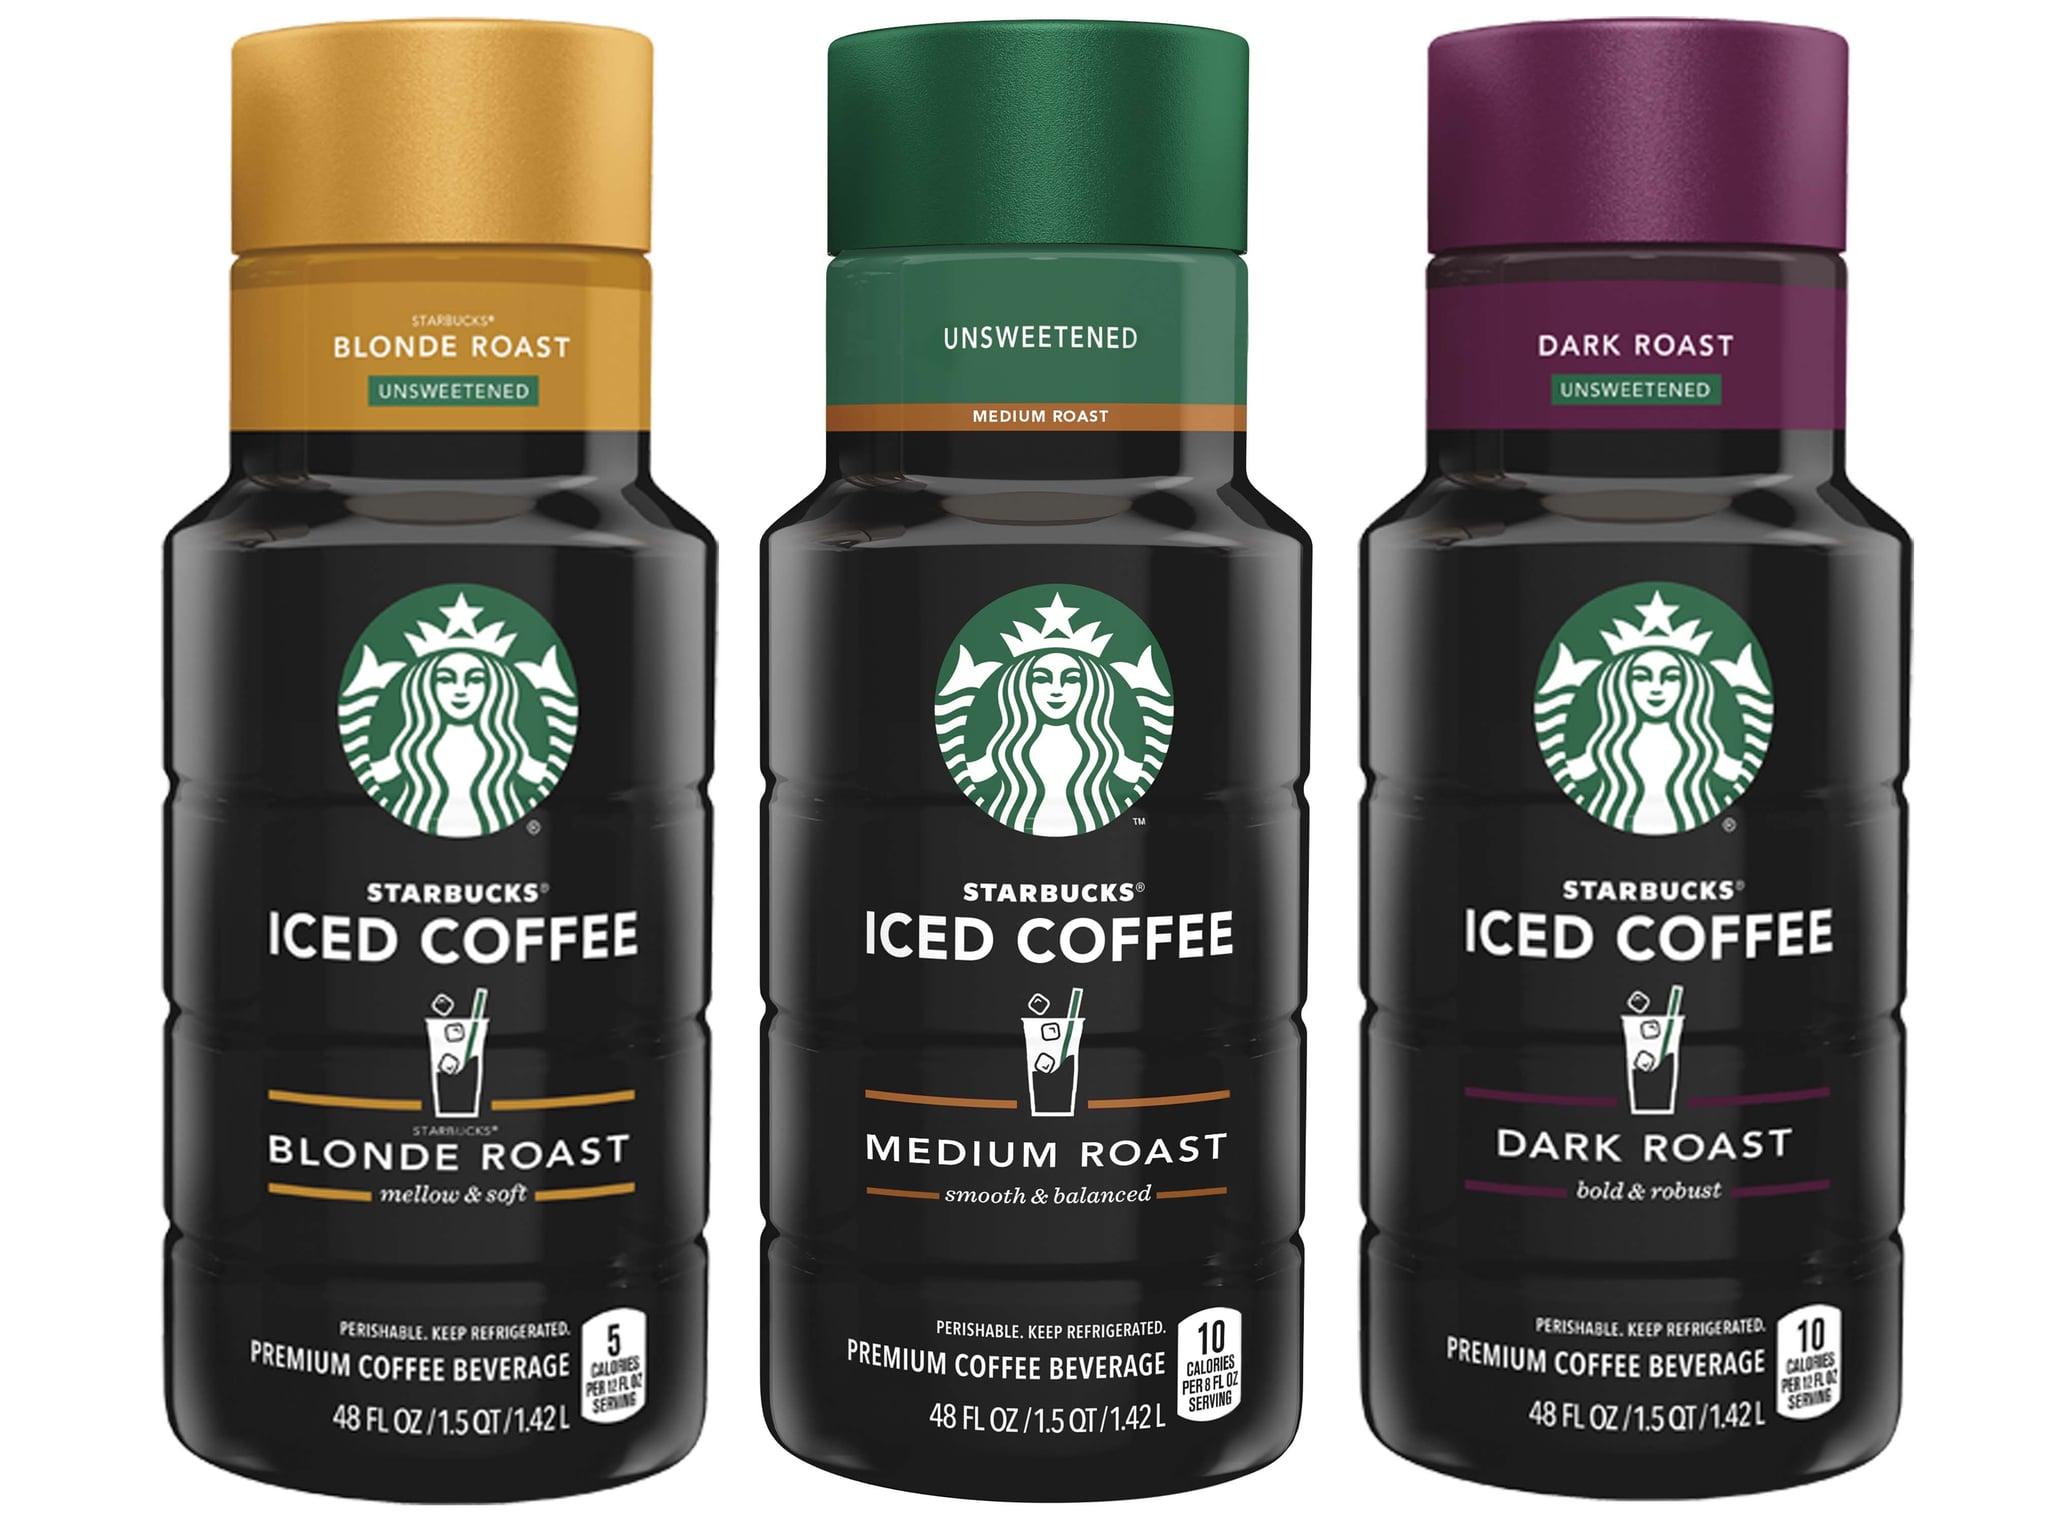 Starbucks Cold Brew At Home Popsugar Food